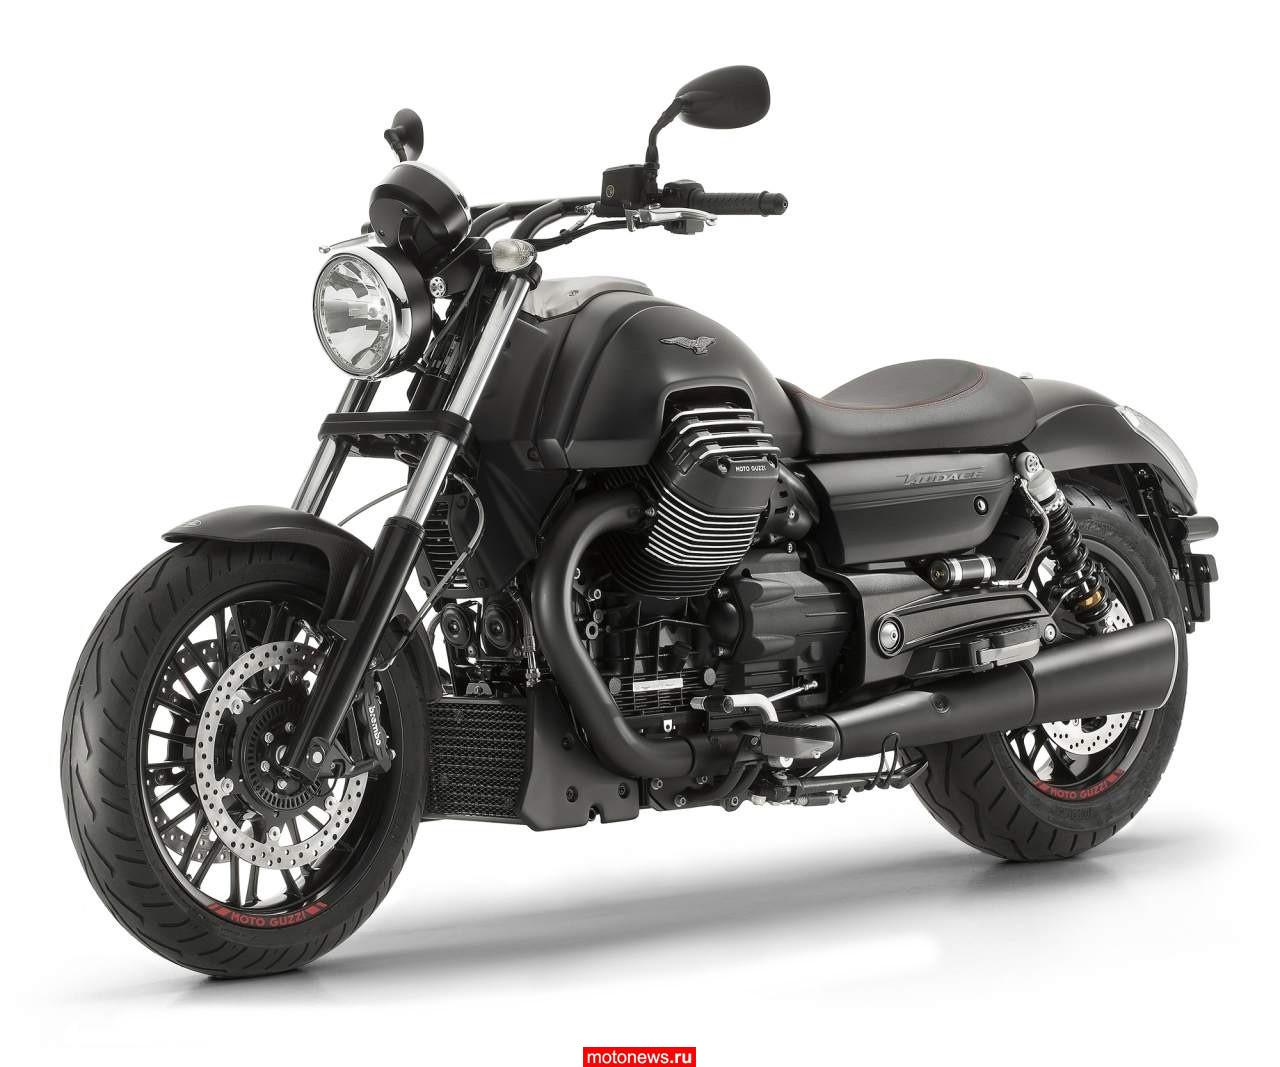 Новый мотоцикл Moto Guzzi полностью без хрома